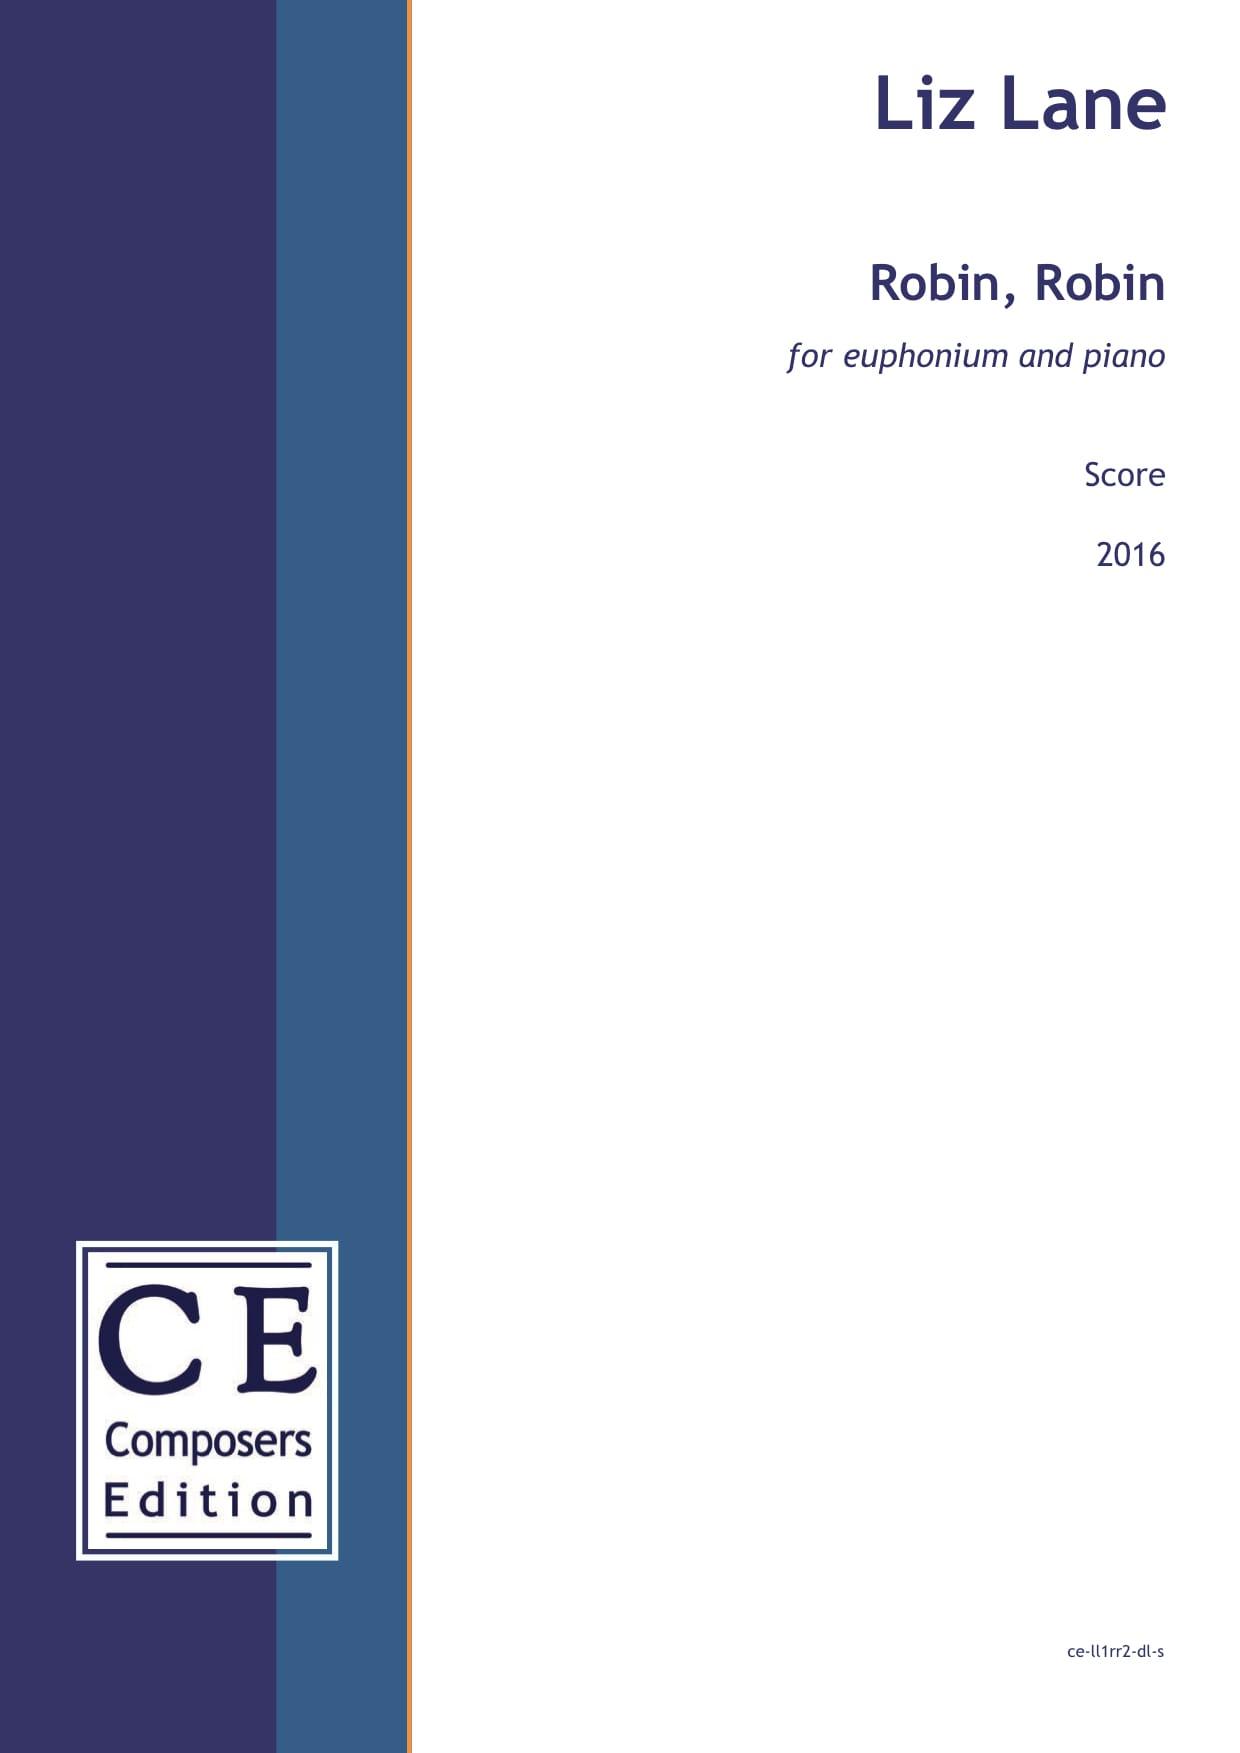 Liz Lane: Robin, Robin (euphonium and piano version) for euphonium and piano